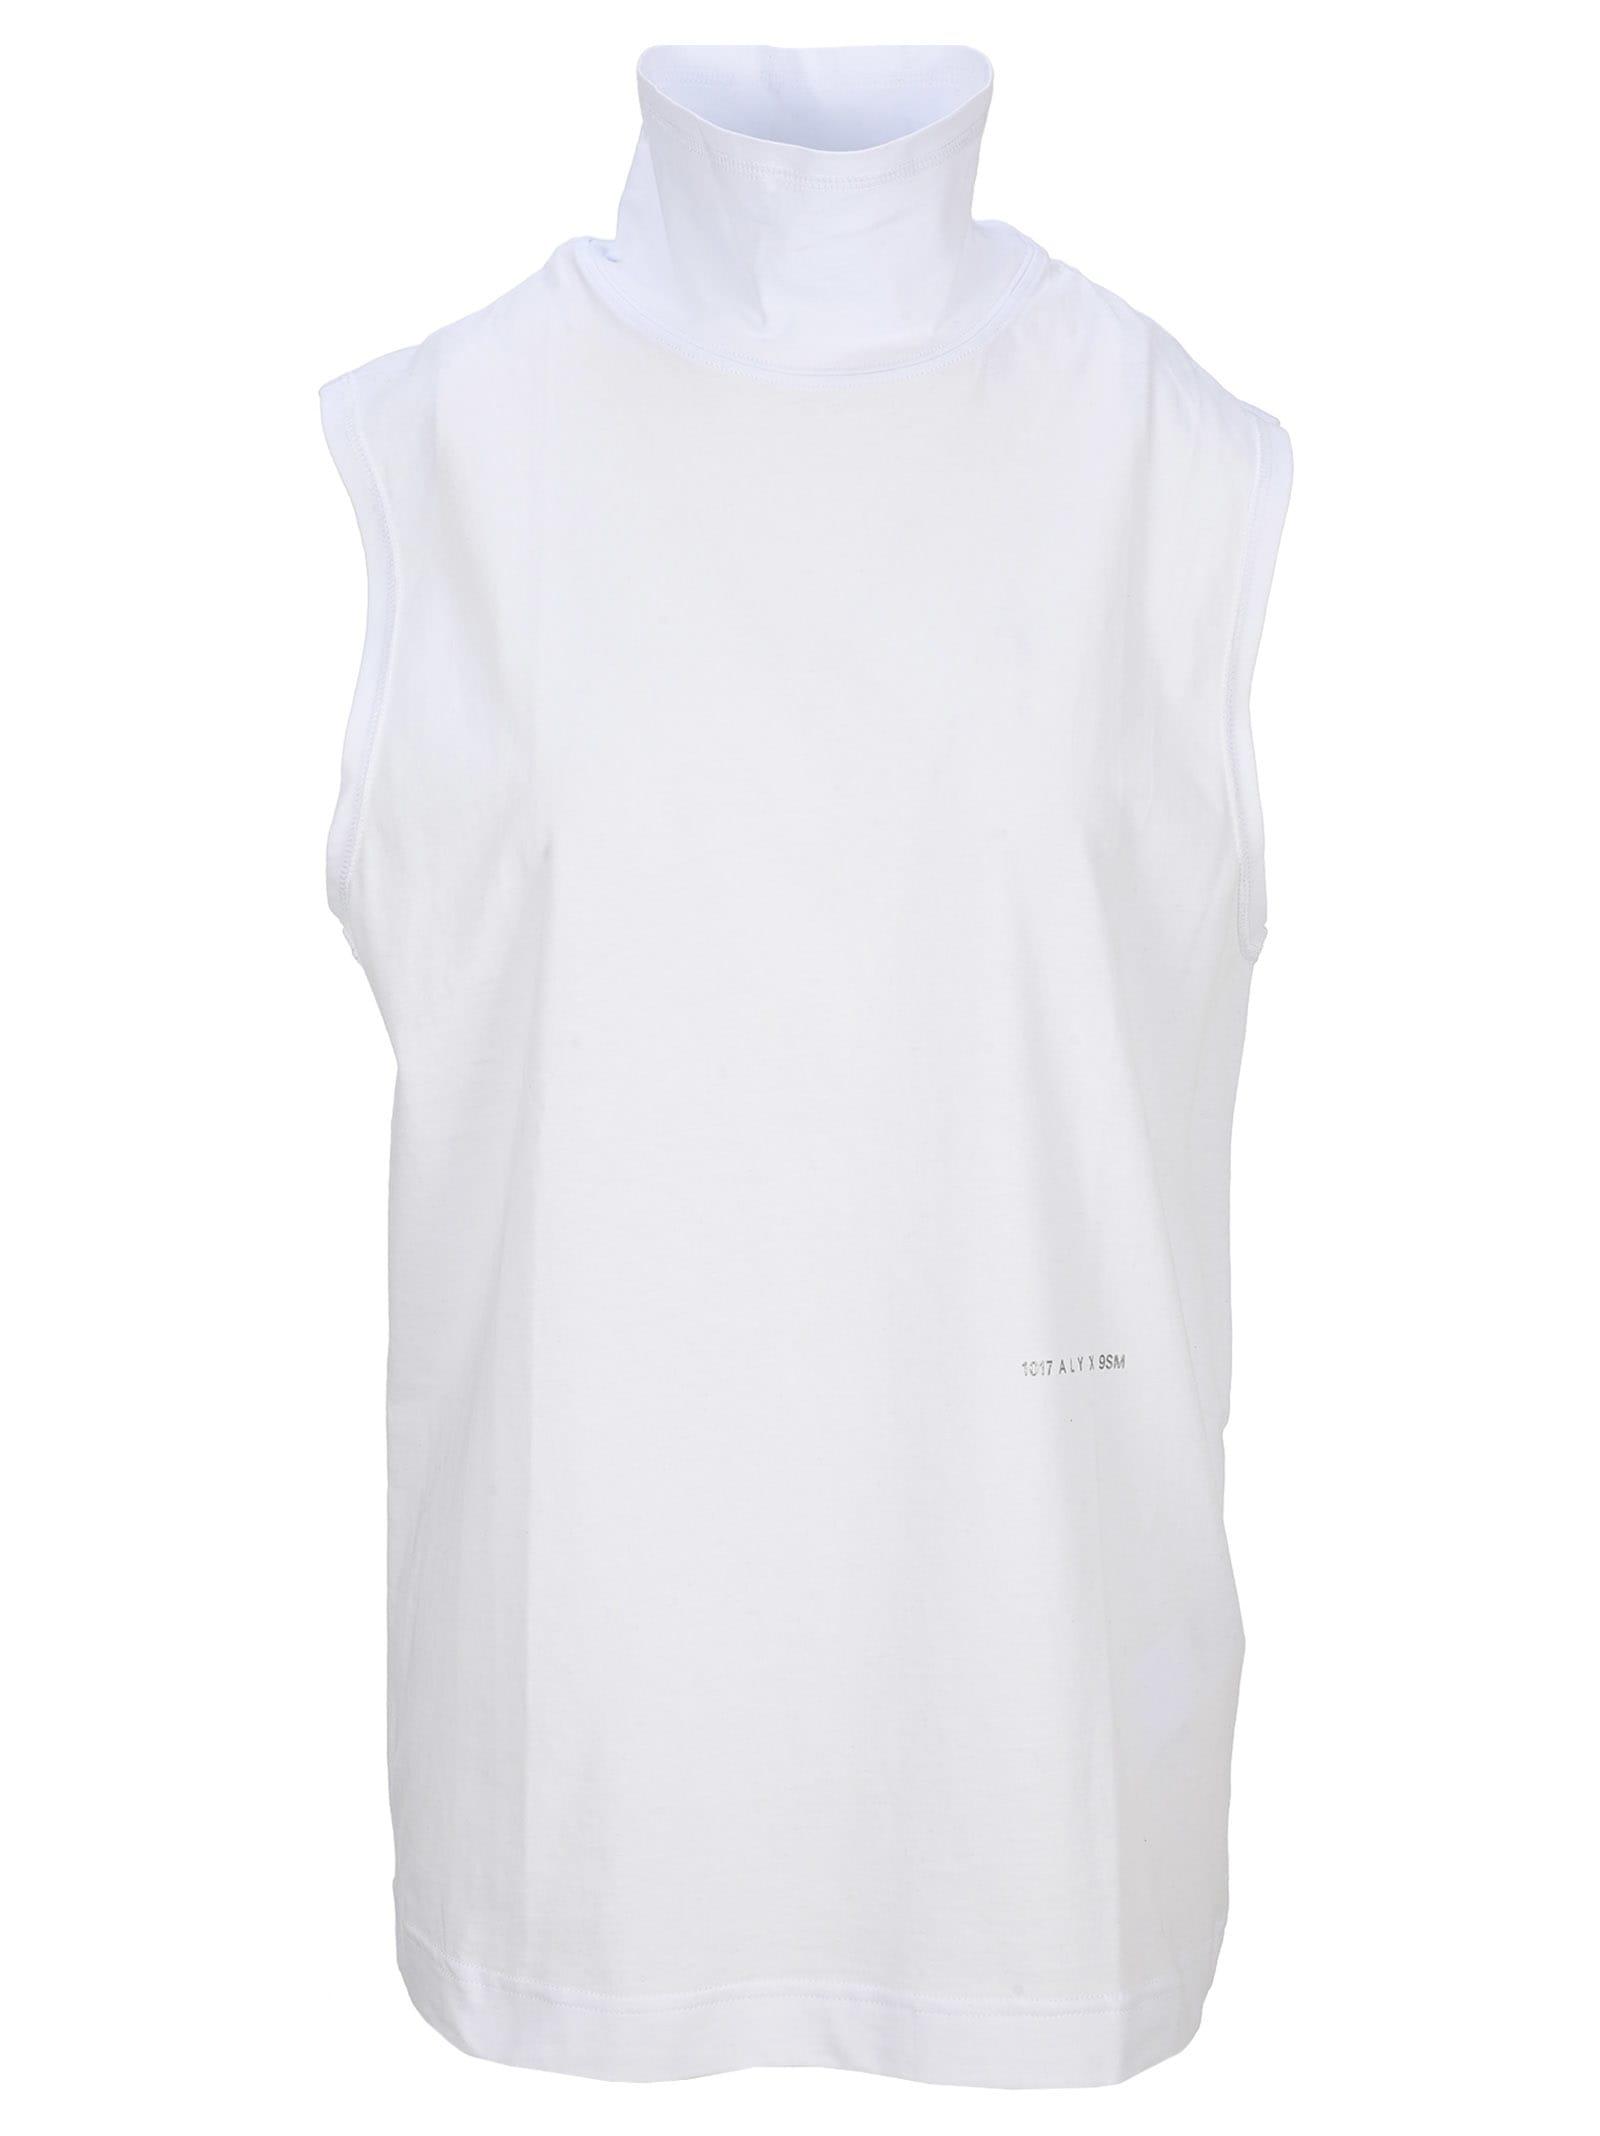 Alyx Clothing ALYX HIGH NECK TANK TOP